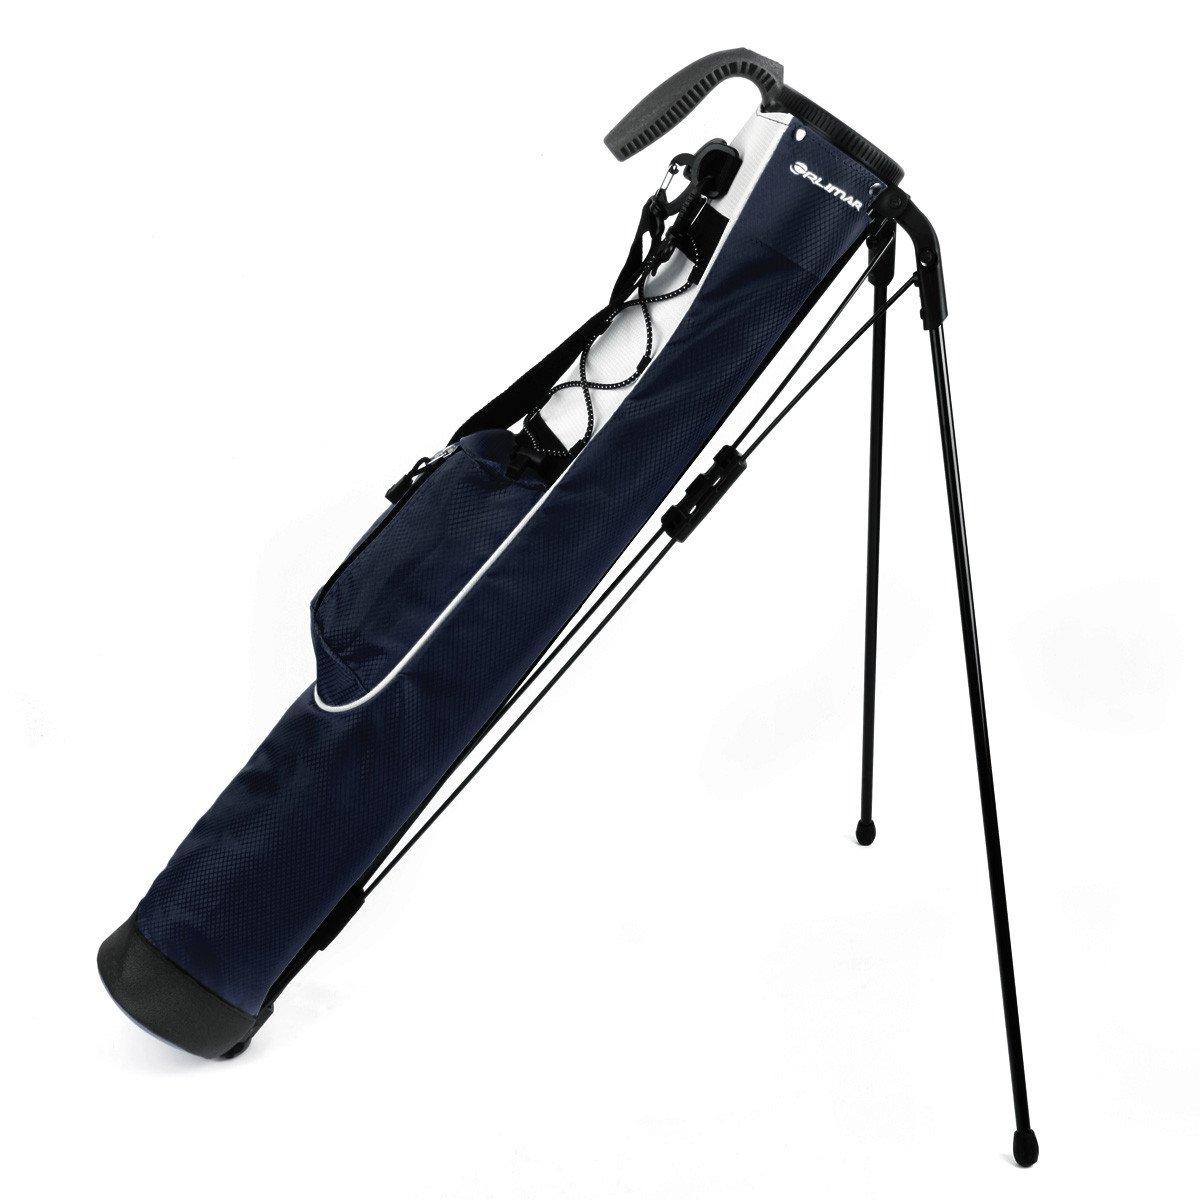 Orlimar Pitch & Putt Golf Lightweight Stand Carry Bag, Midnight Blue by Orlimar